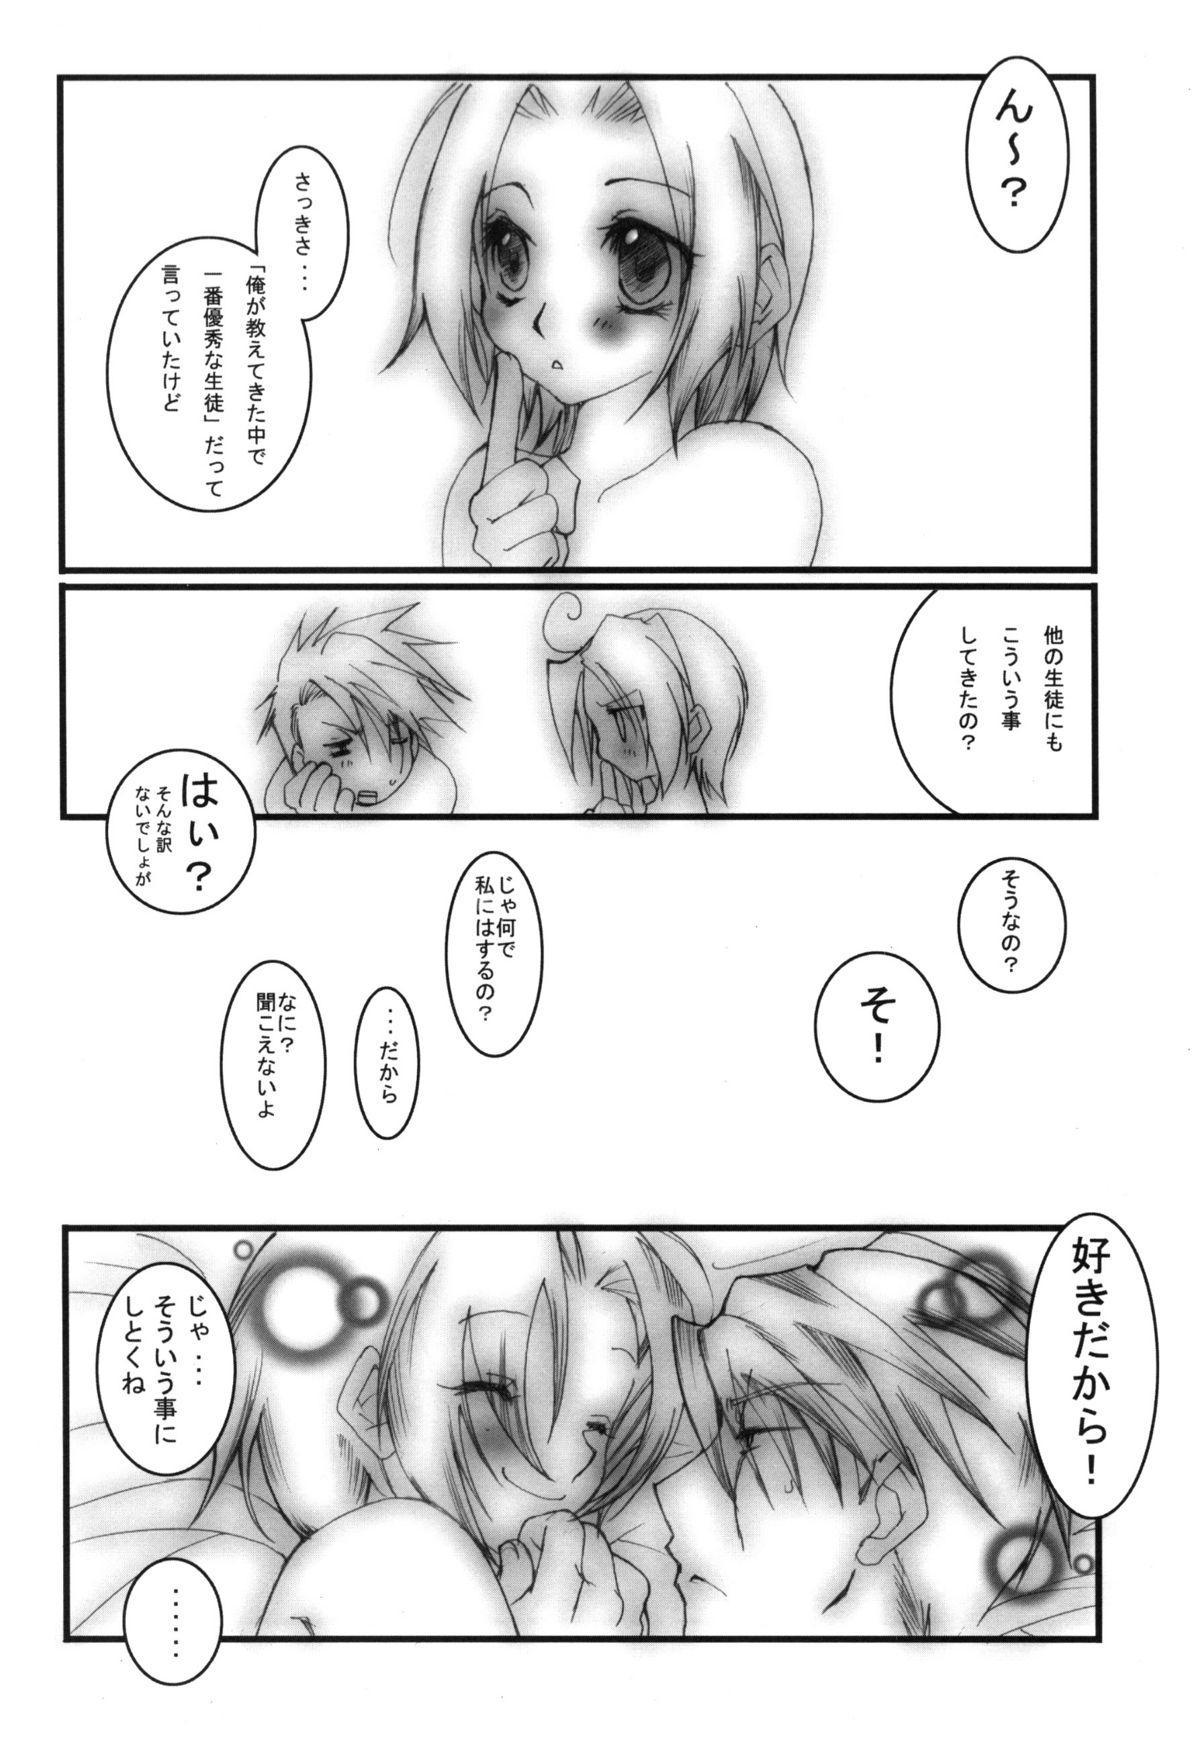 (C70) [HAMUSTAR (Chibinyo)] Hamu-juu -San- (Naruto) 16